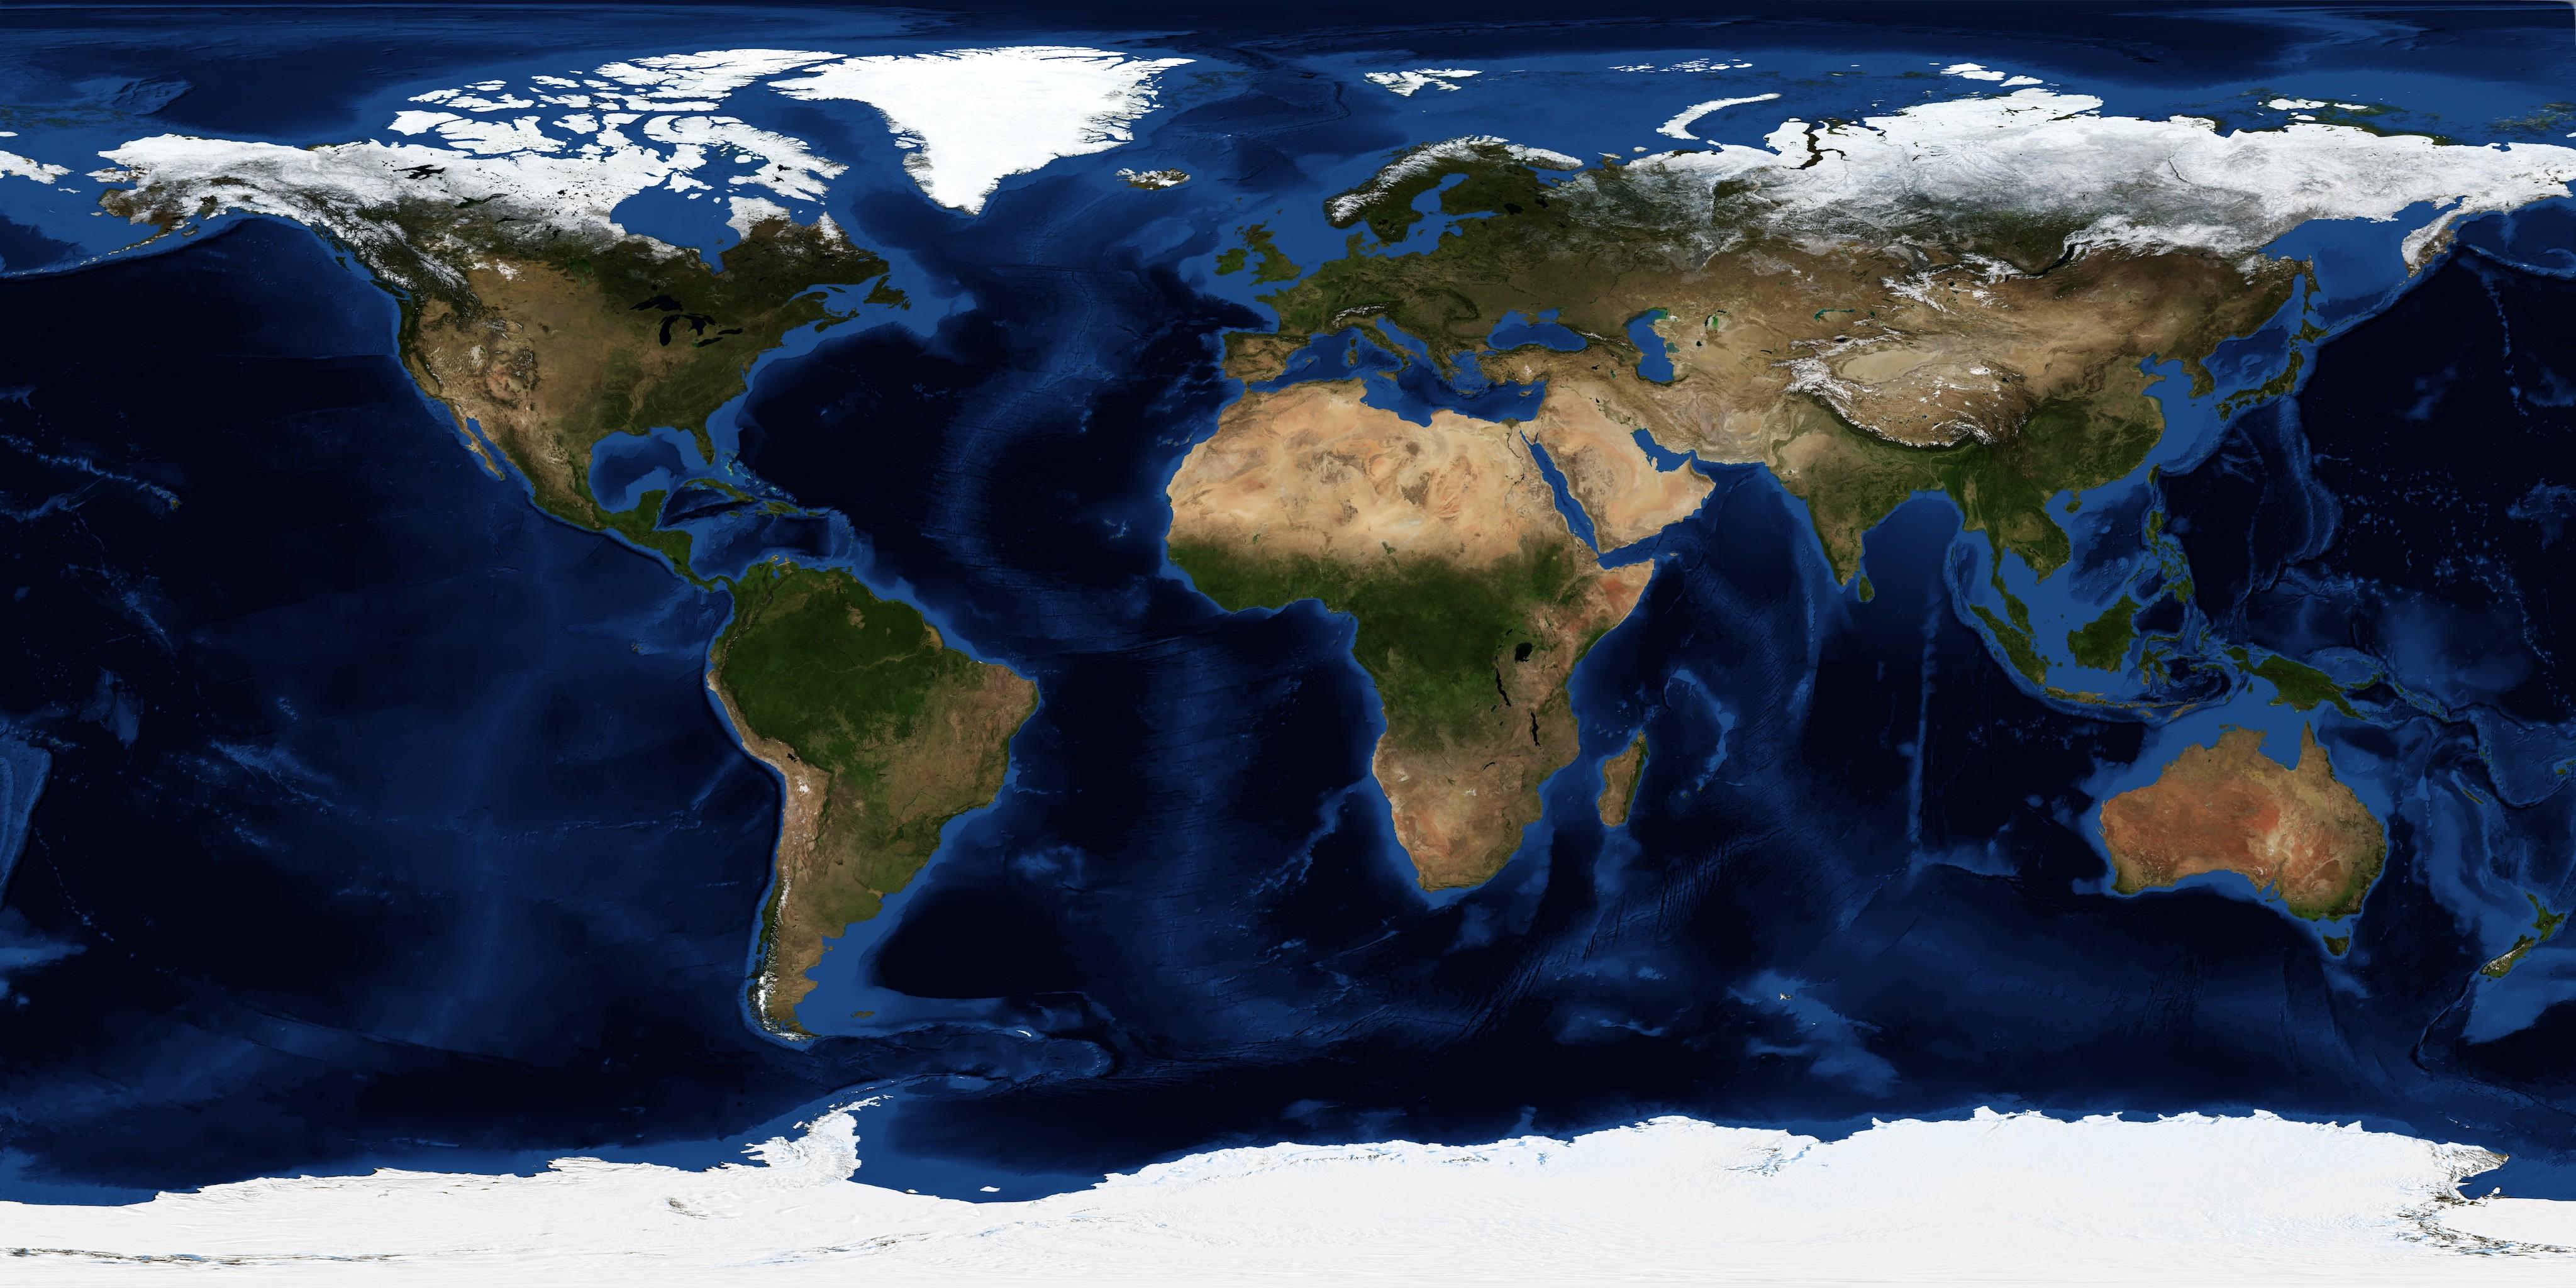 _earth-blue-marble-4k.jpg